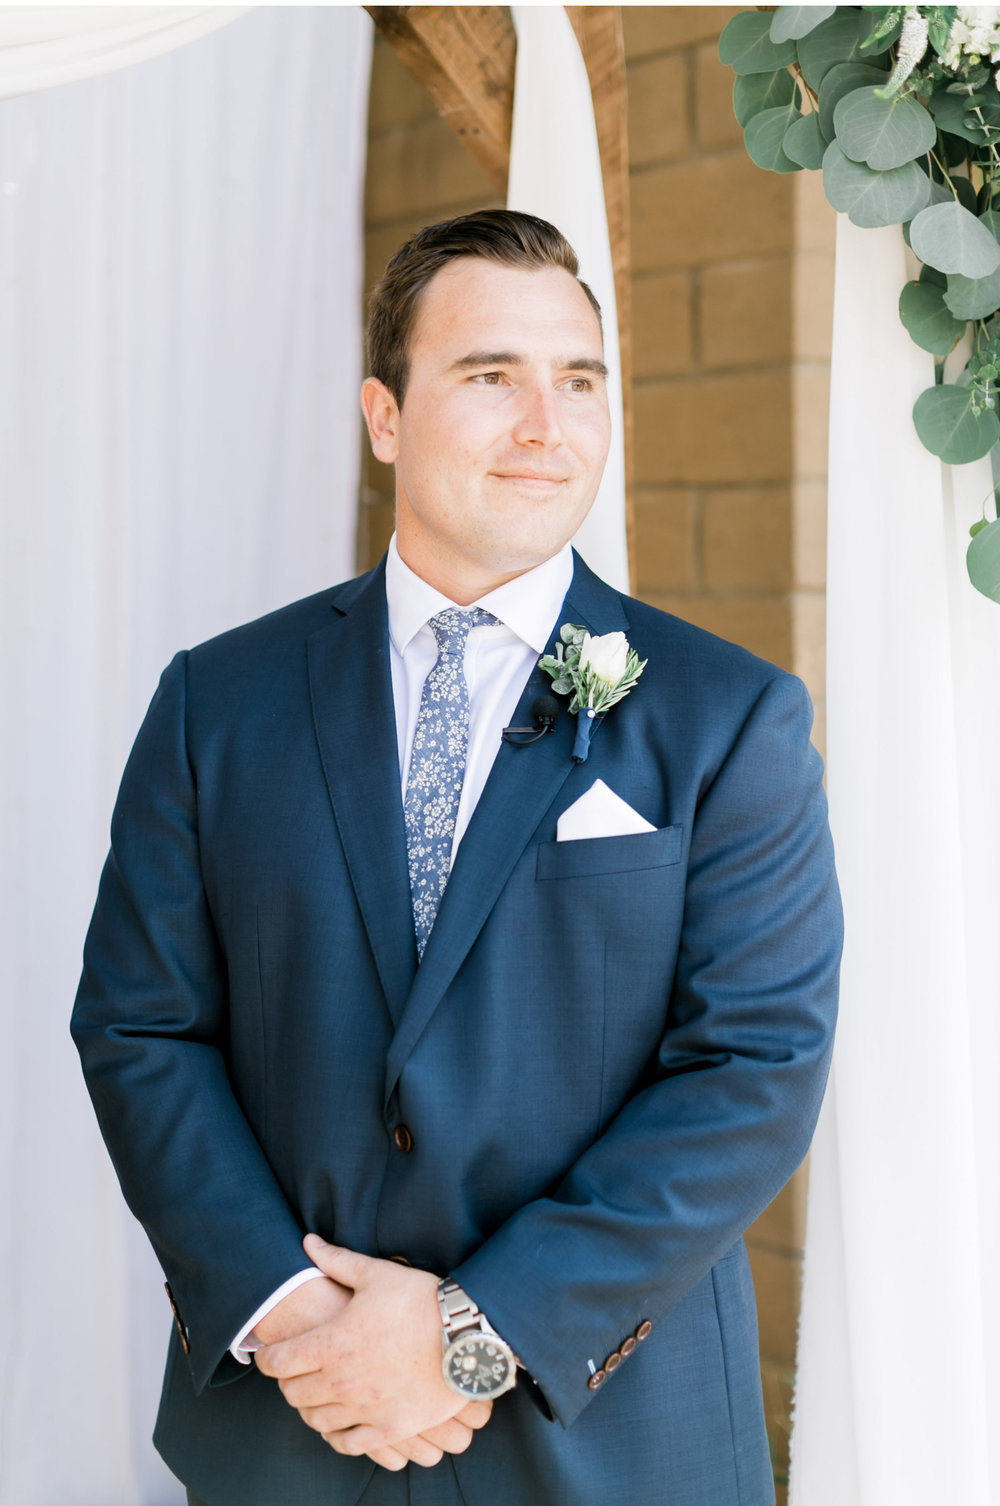 San-Luis-Obispo-Wedding-Photographer-Natalie-Schutt-Photography-Style-Me-Pretty_15.jpg